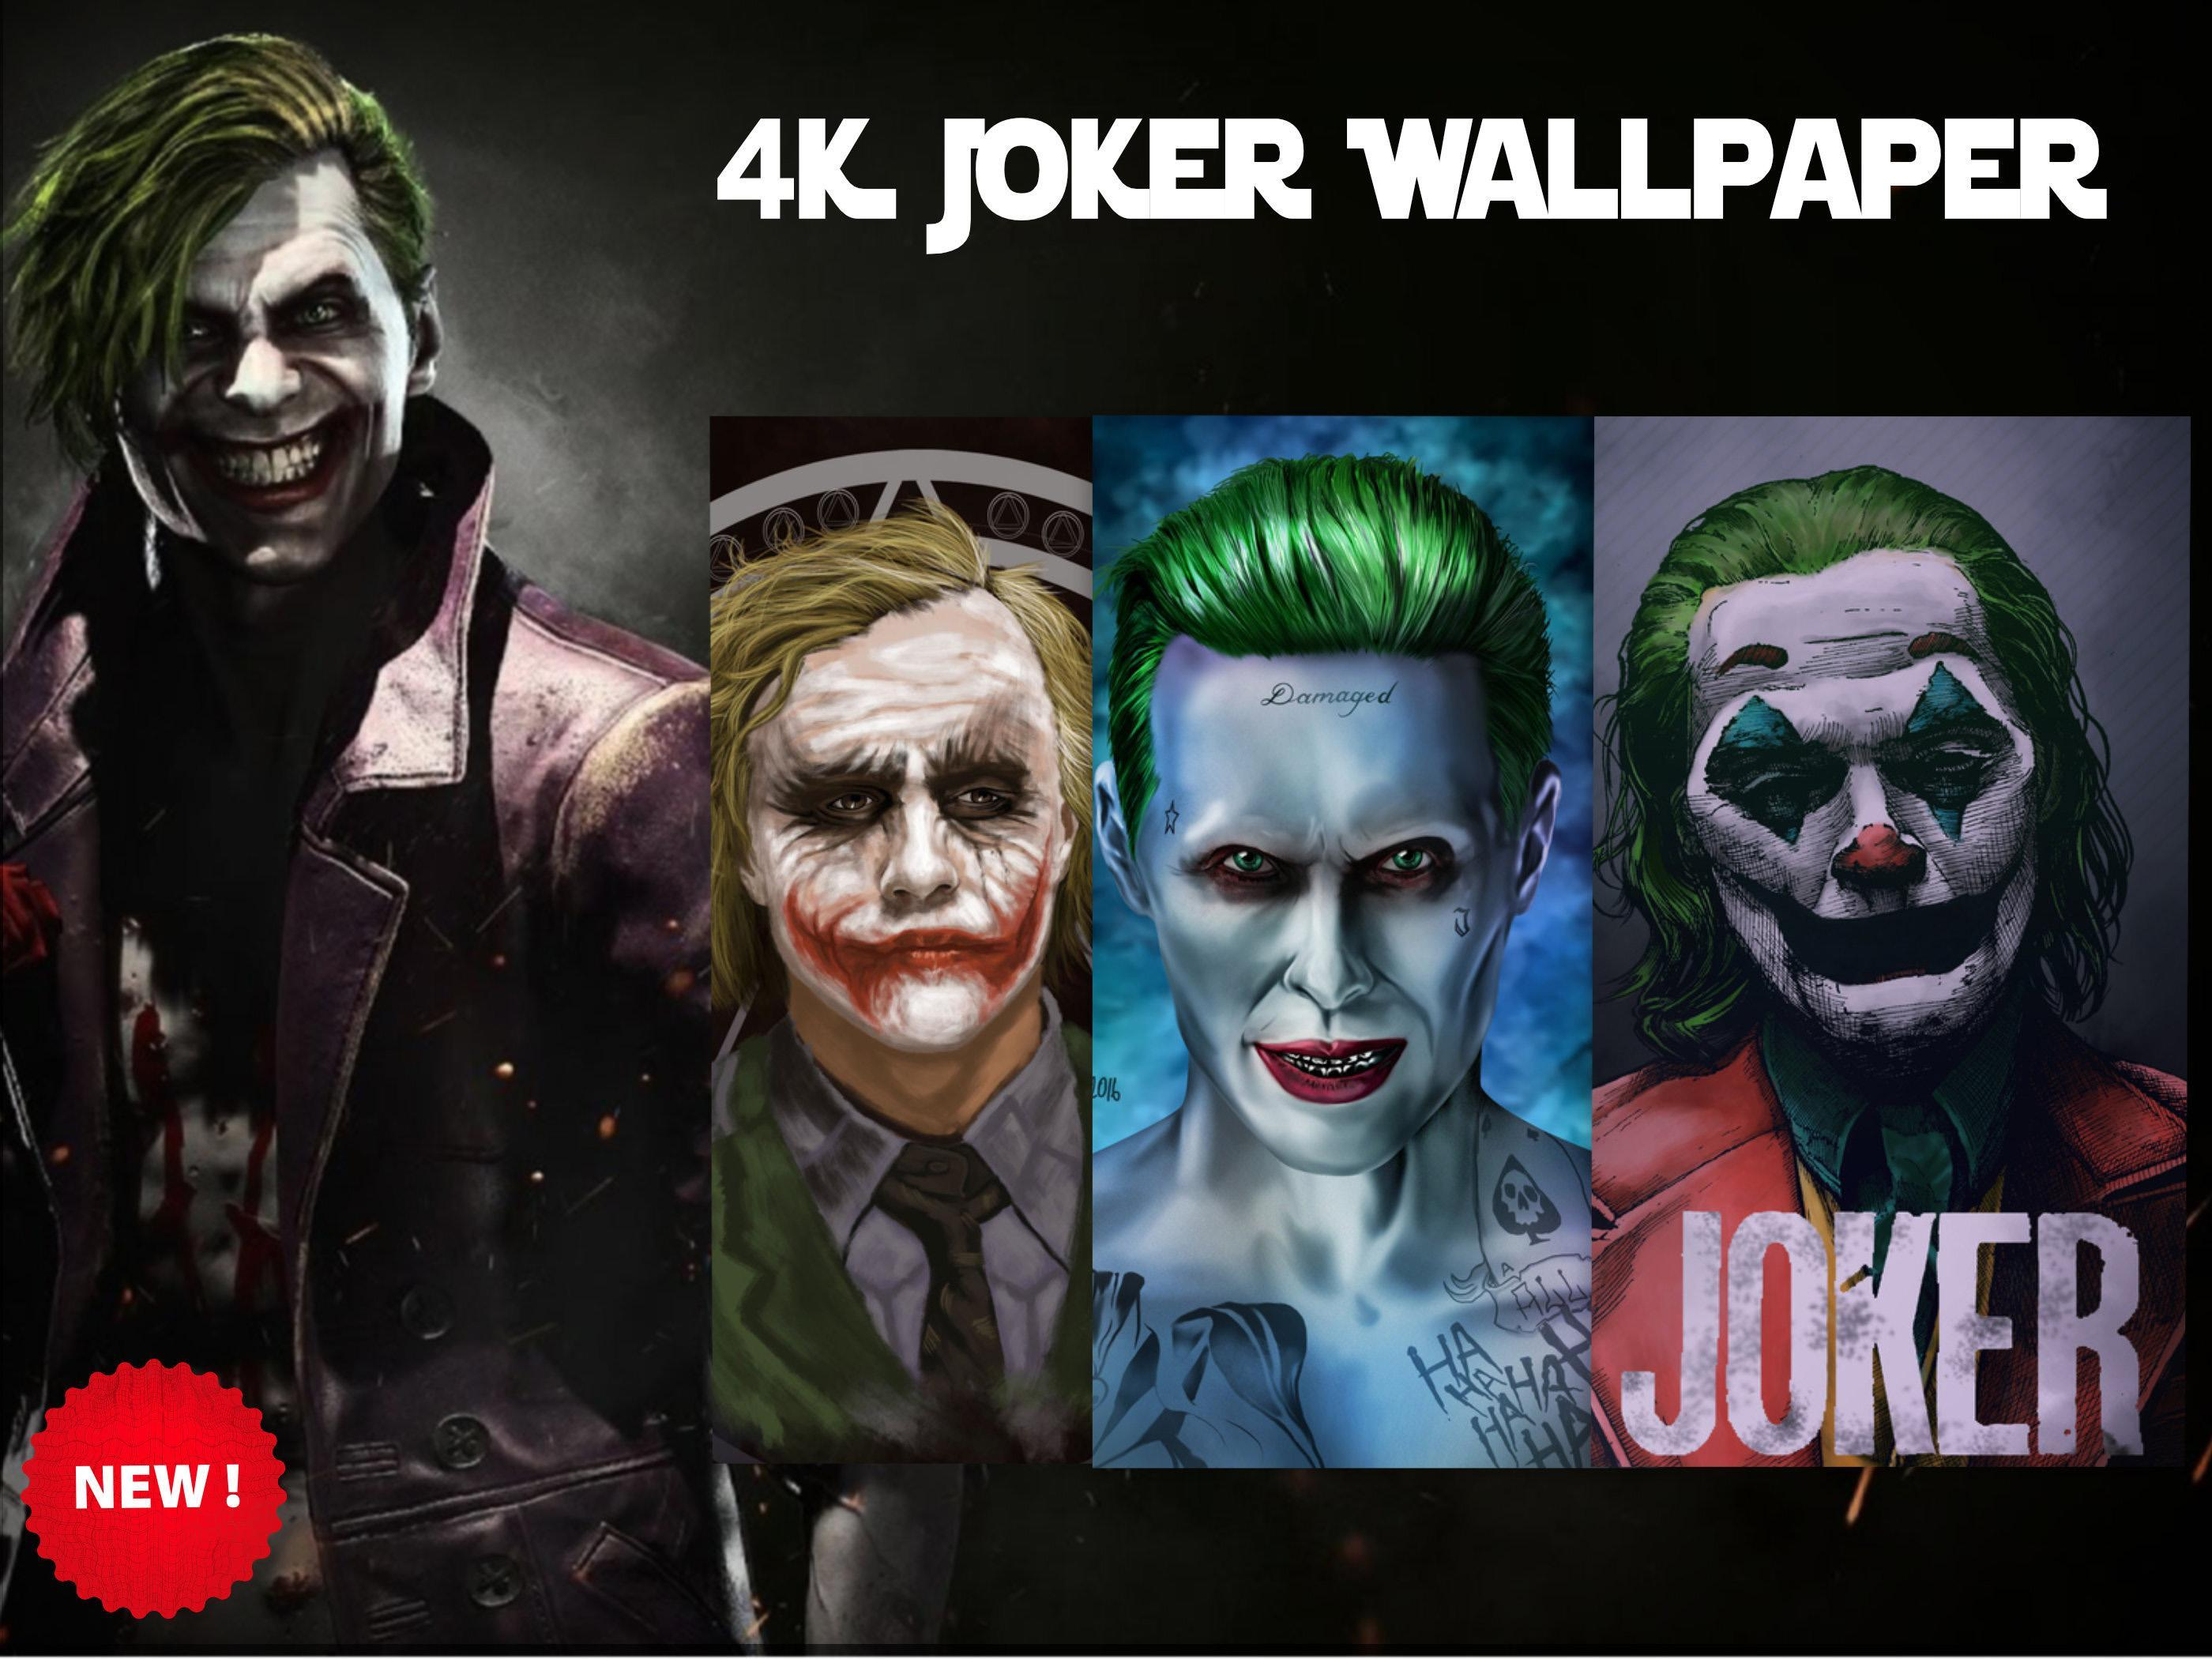 Wallpaper For Joker 4k For Android Apk Download